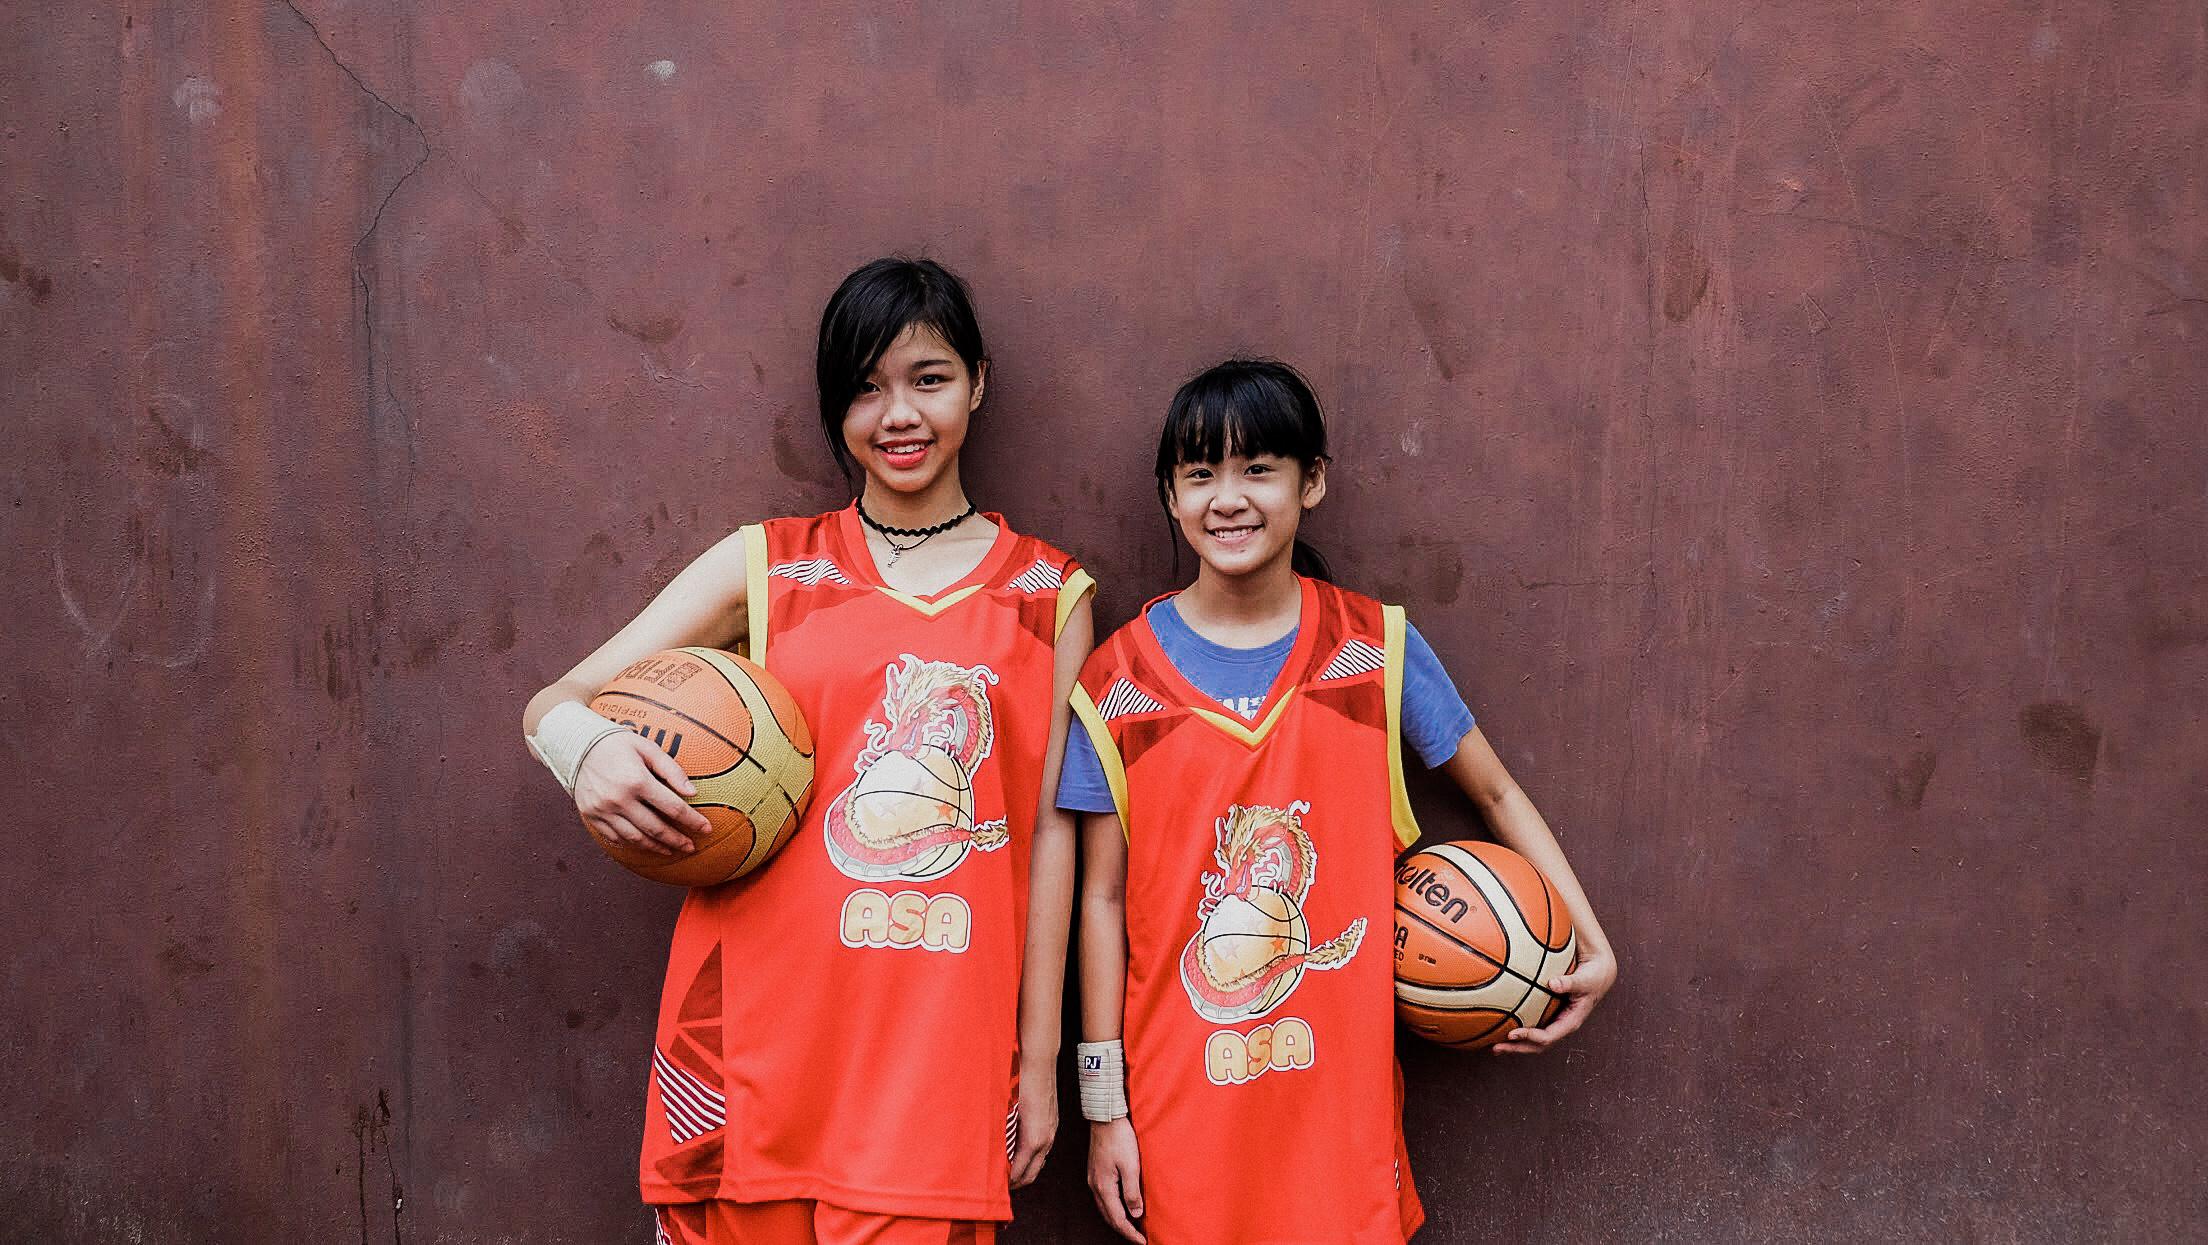 lue Dragon-Children playing basketball (2)